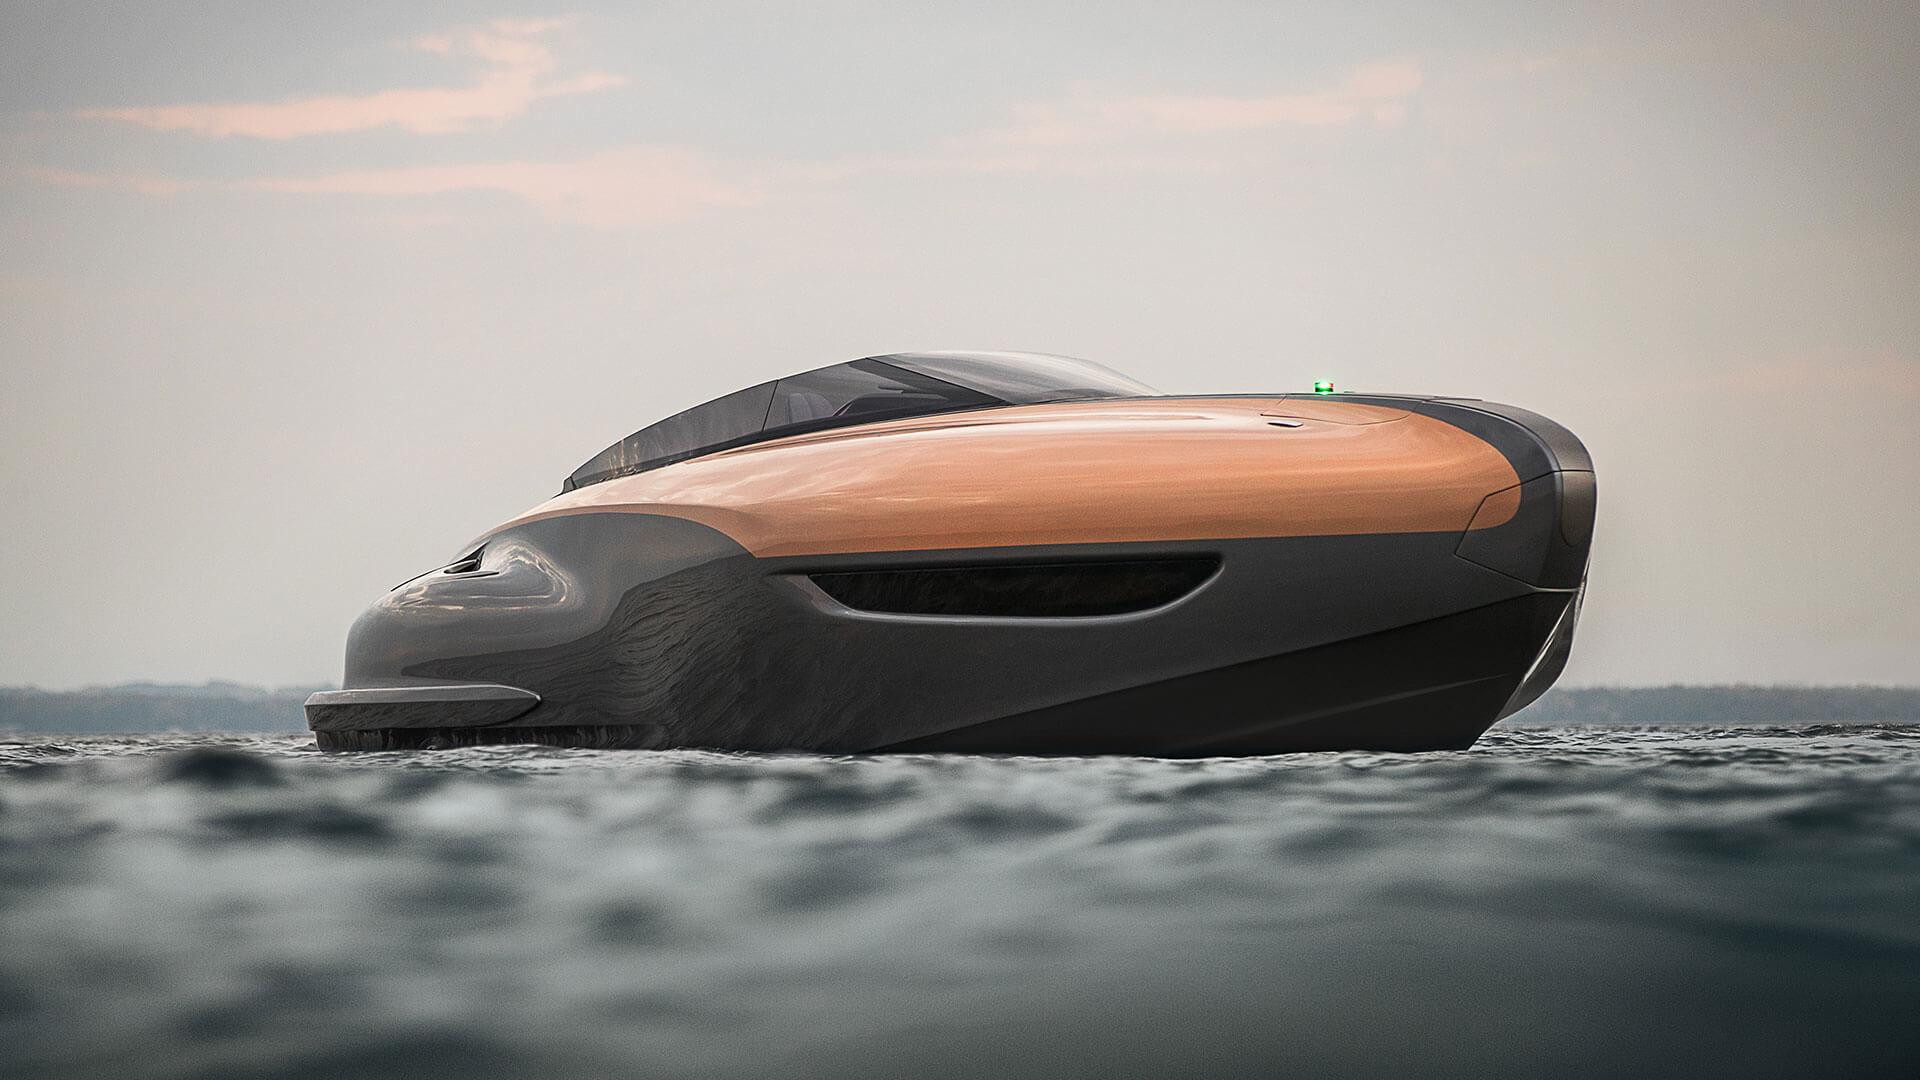 2017 lexus yacht gallery04